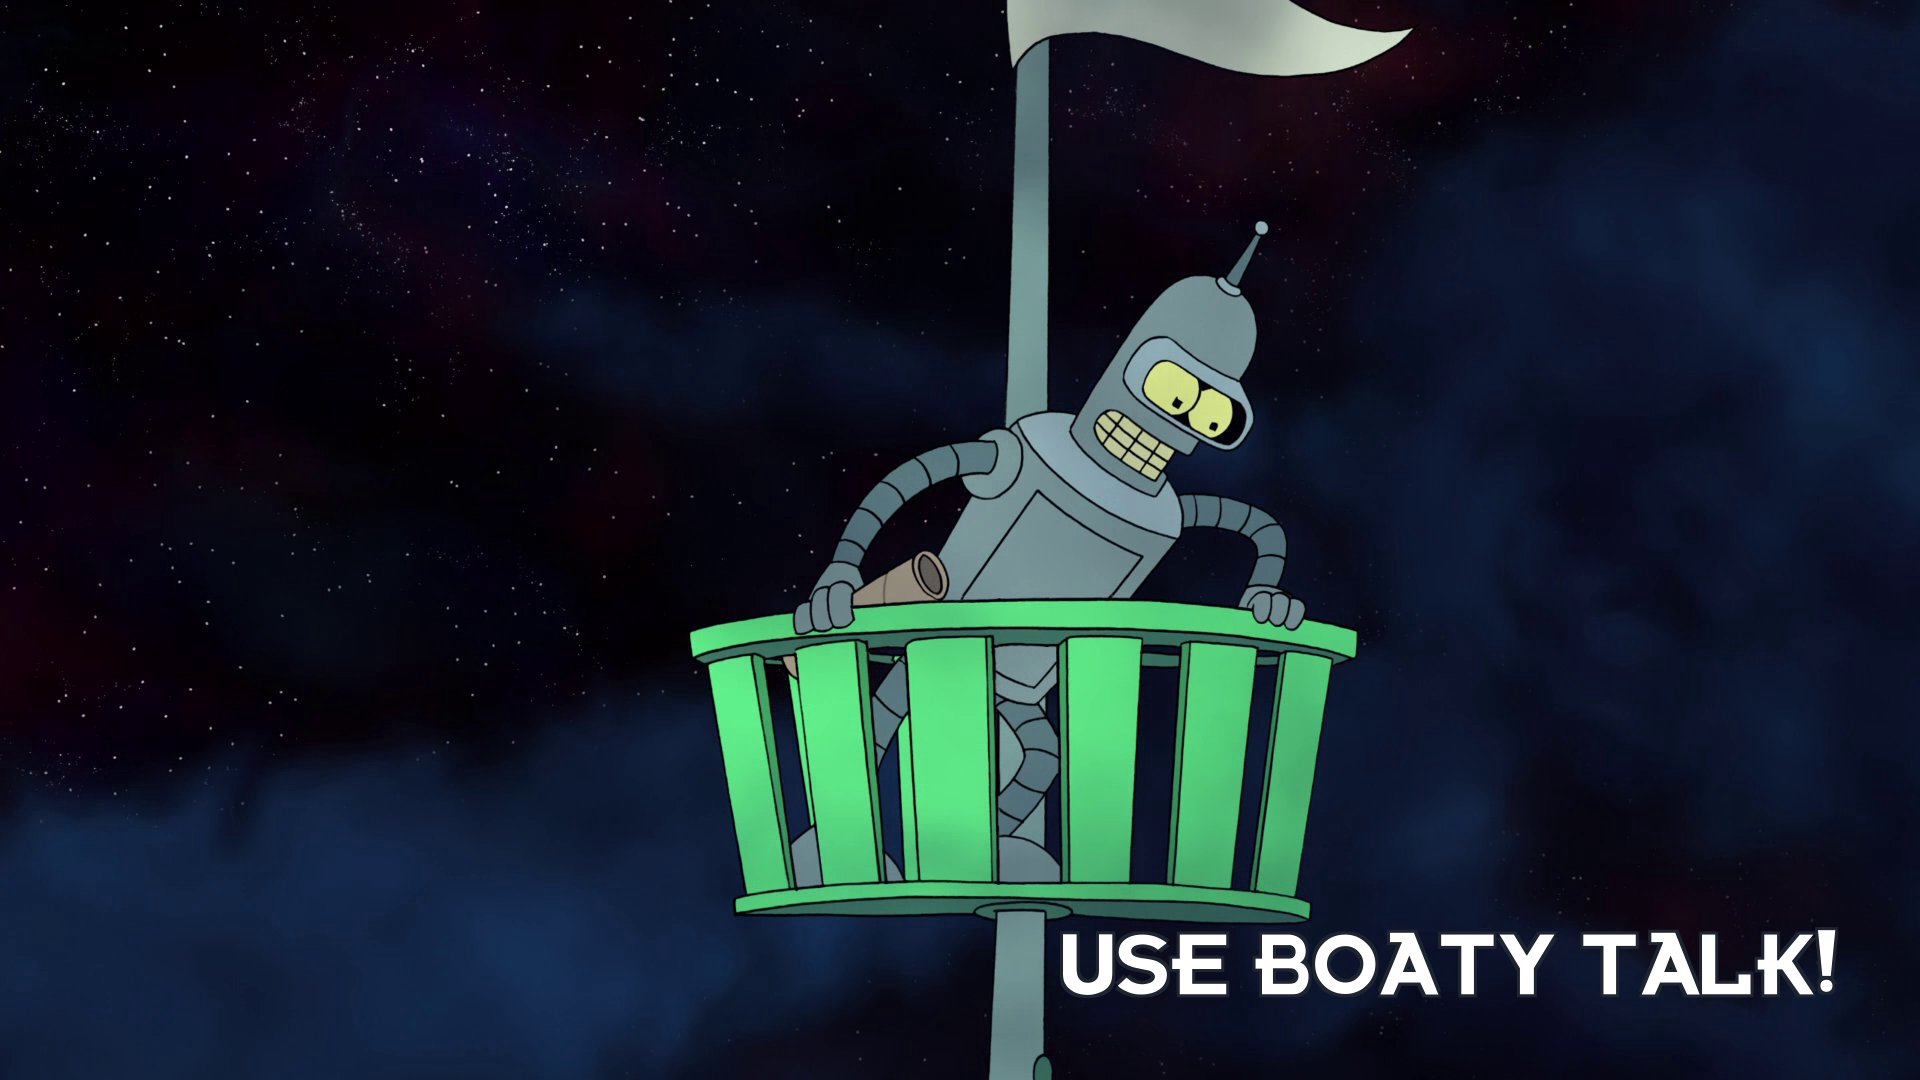 Turanga Leela: Use boaty talk!